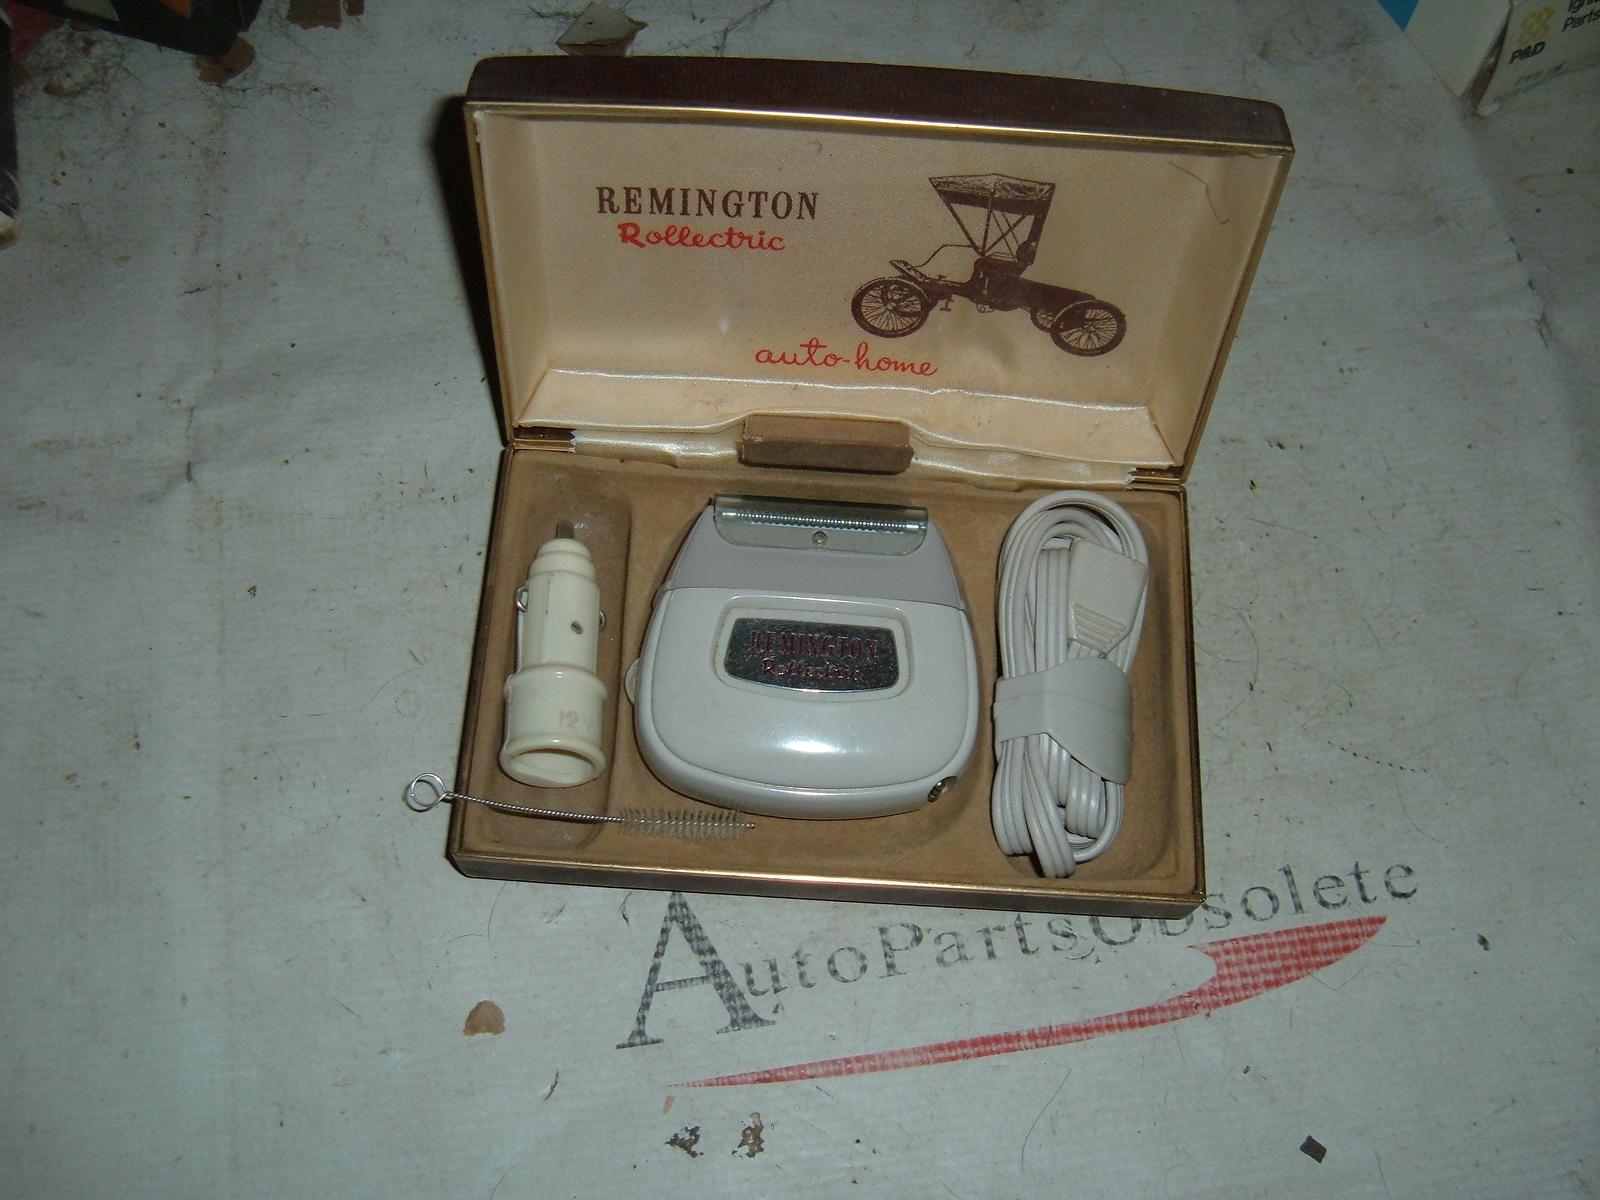 1955 era dodge chevrolet ford remington electric car shaver (z remington shaver)